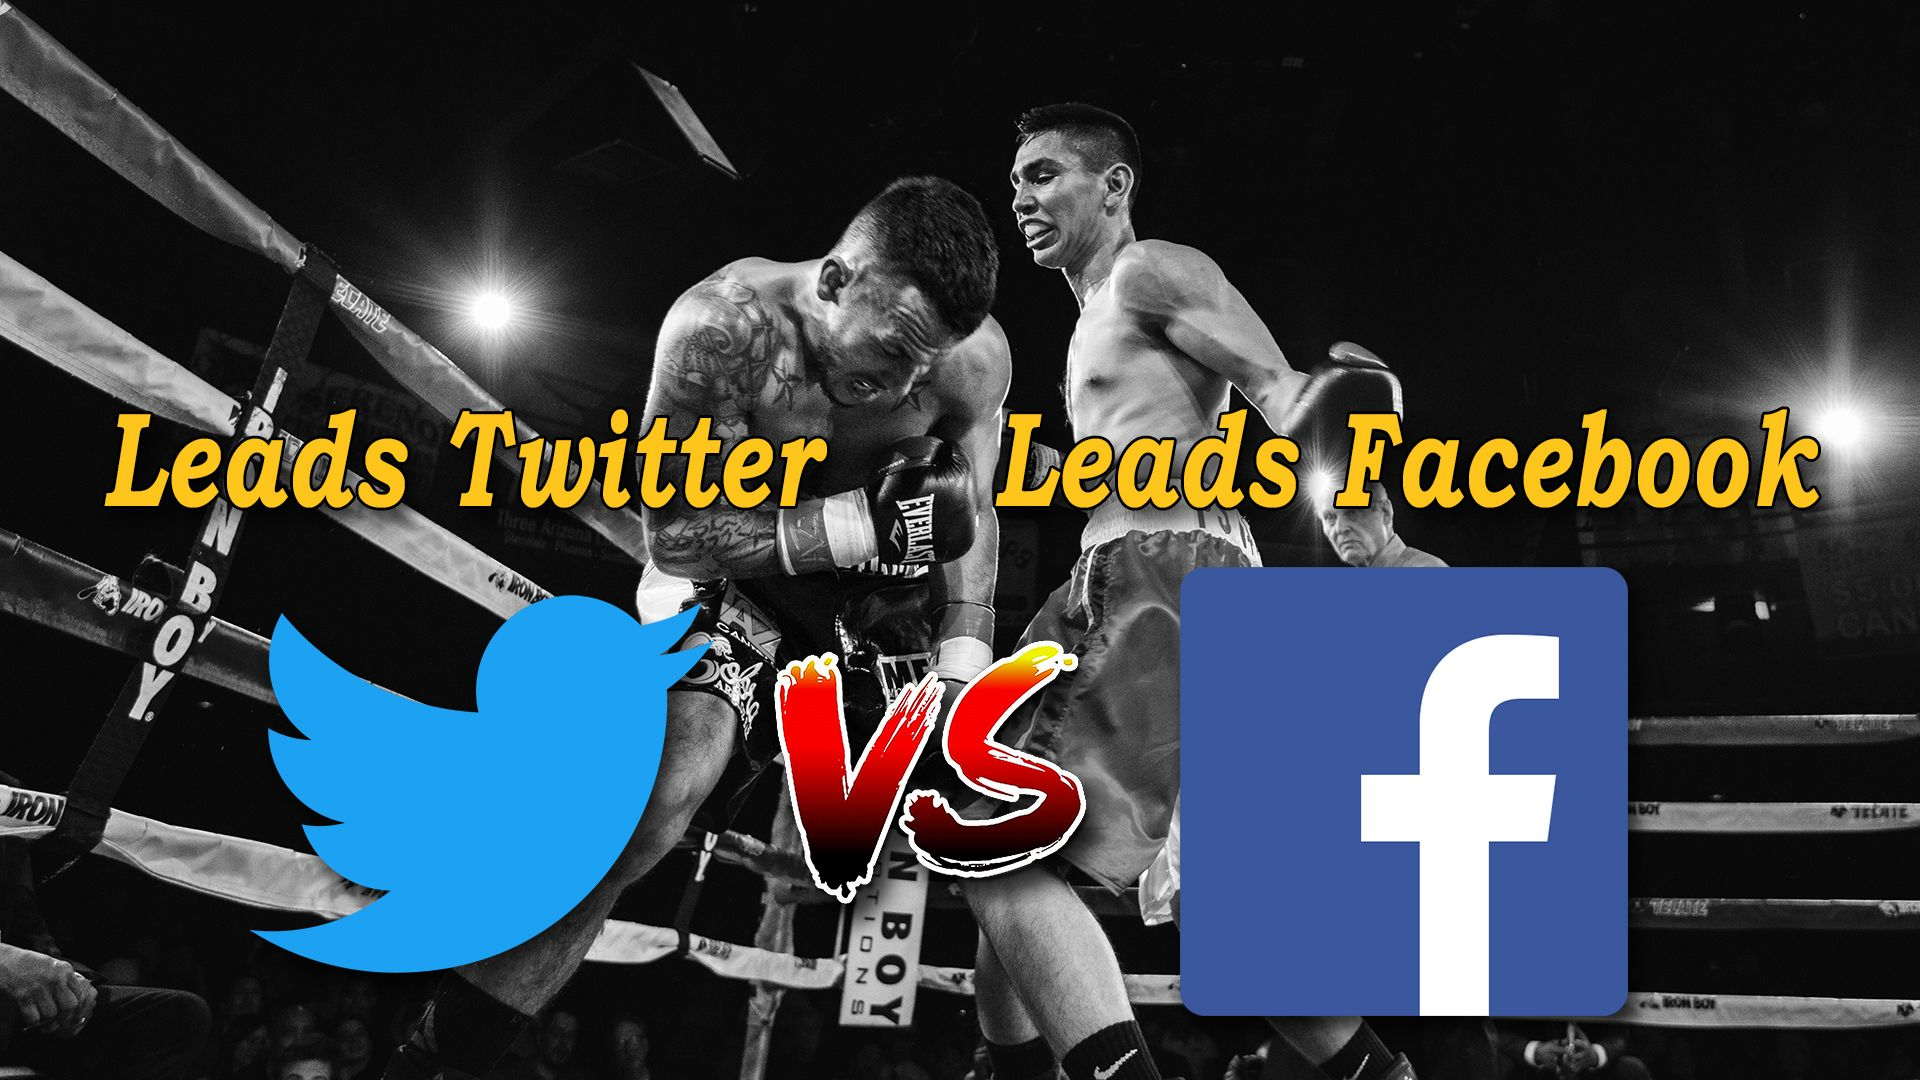 Leads Twitter Vs Leads Facebook #GrowthHacking #WebMarketing #FormationGrowthHacking #CentreDeFormationFrance #TunnelAARRR #AARRR #SocialMedia #CommunityManagement #SEO #MarketingDigital #SiteWeb